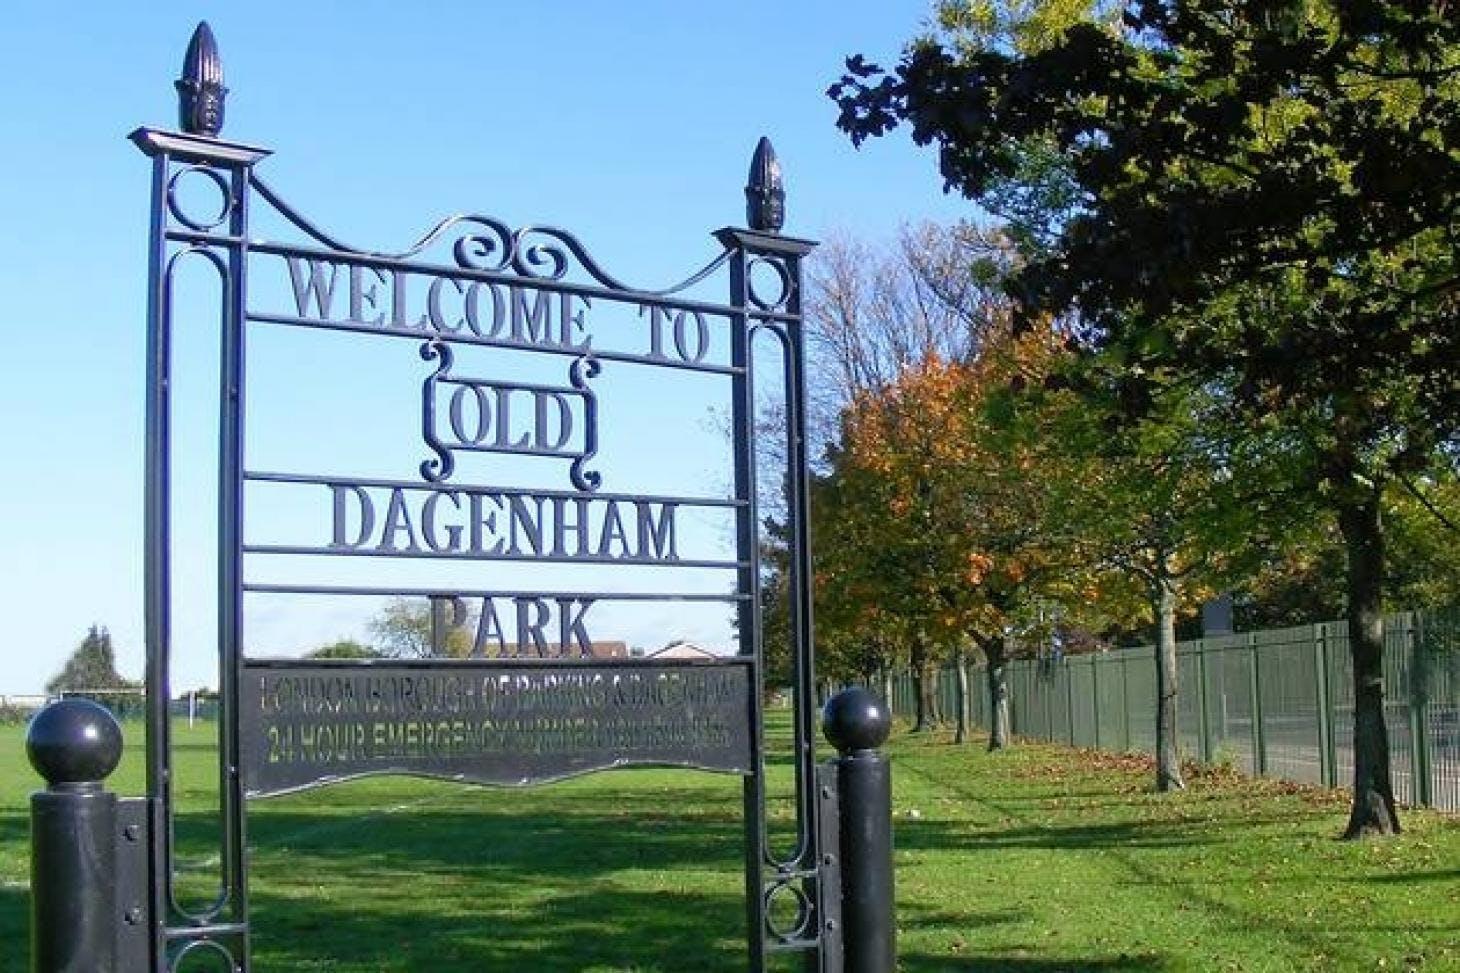 Old Dagenham Park Outdoor | Hard (macadam) netball court